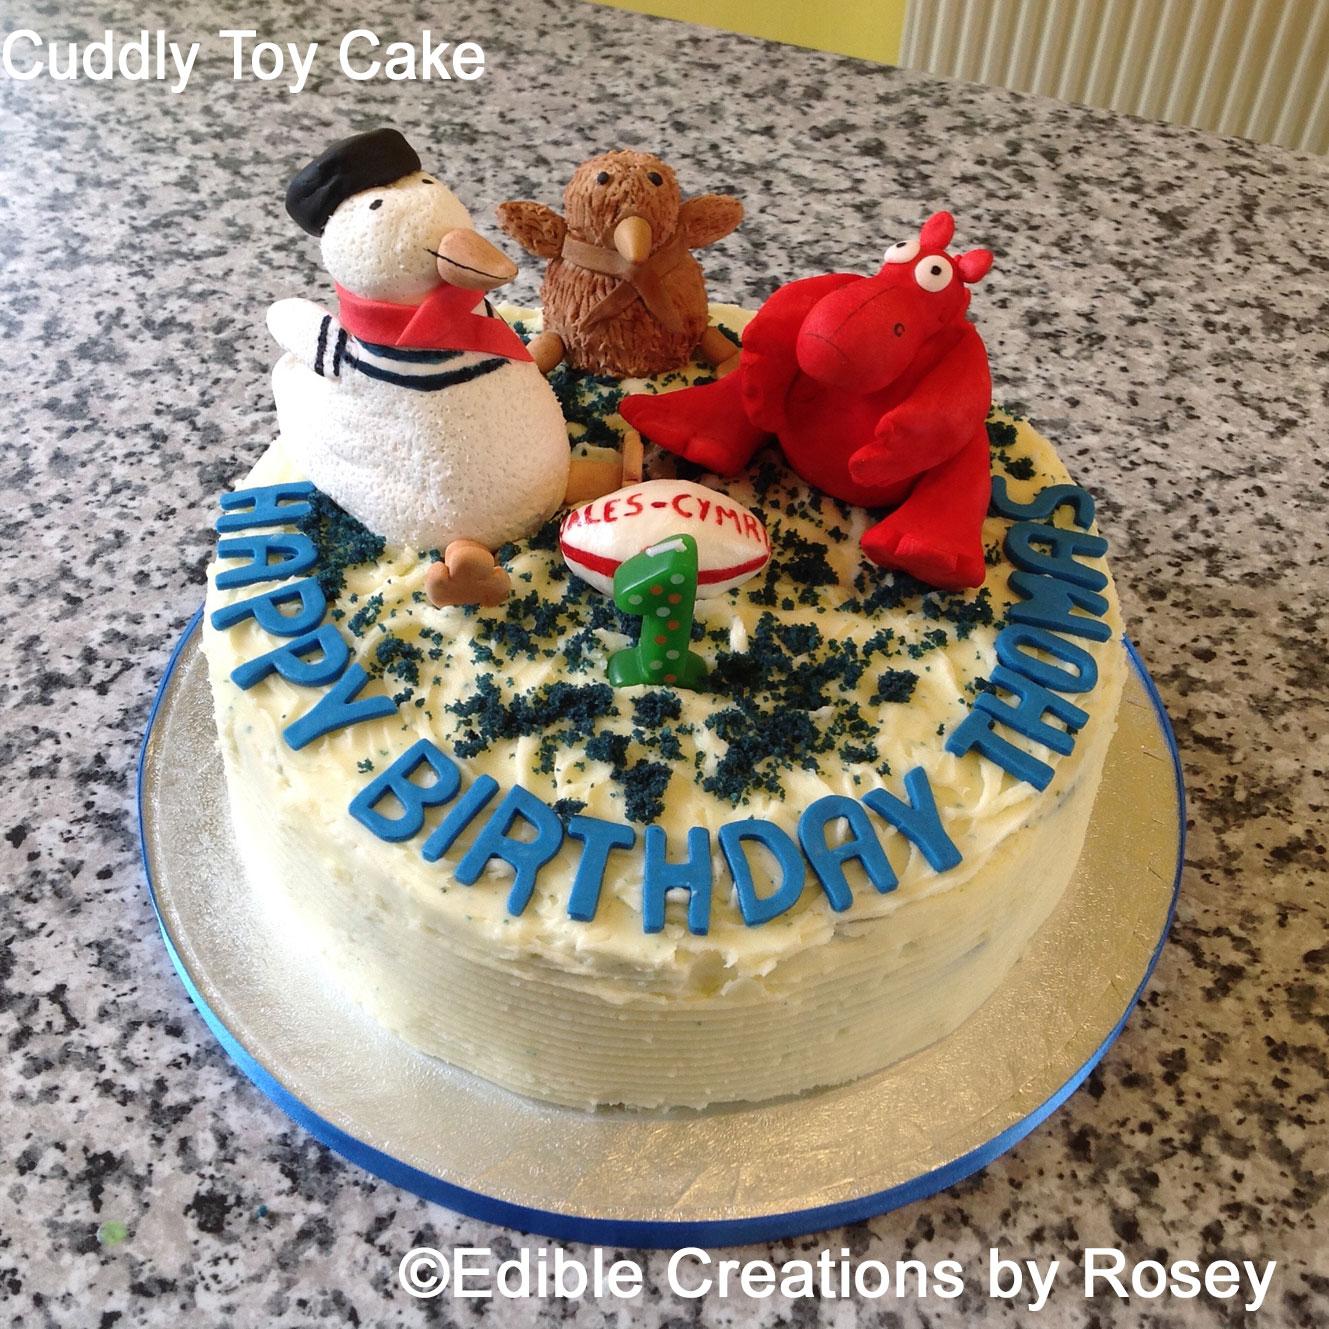 Cuddly Toy Cake